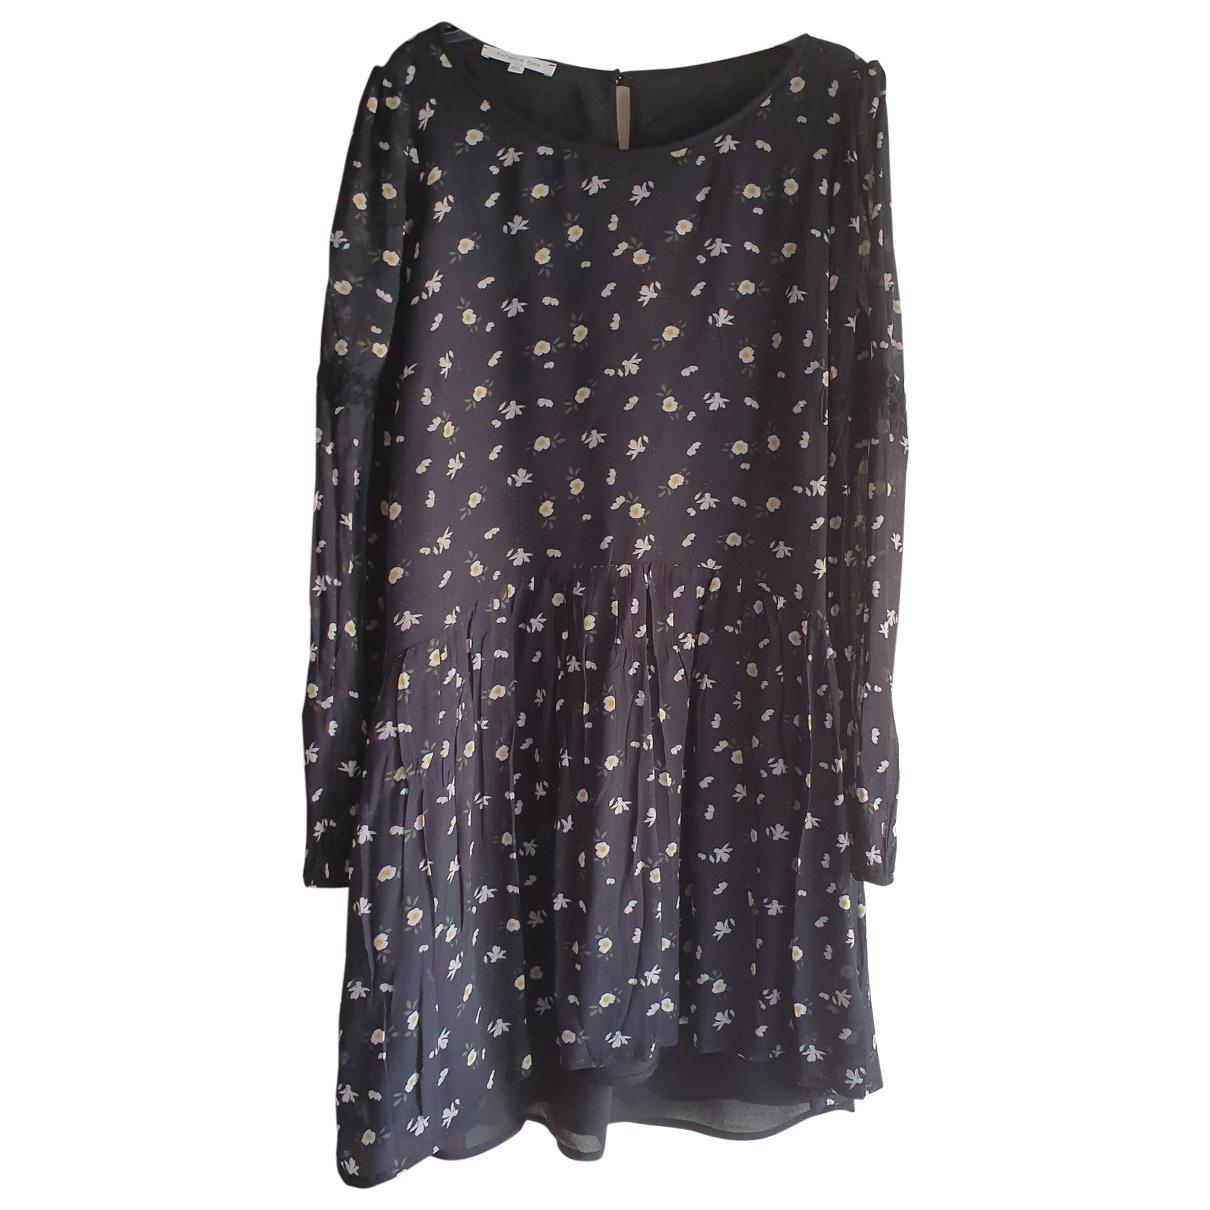 Patrizia Pepe \N Kleid in  Schwarz Polyester